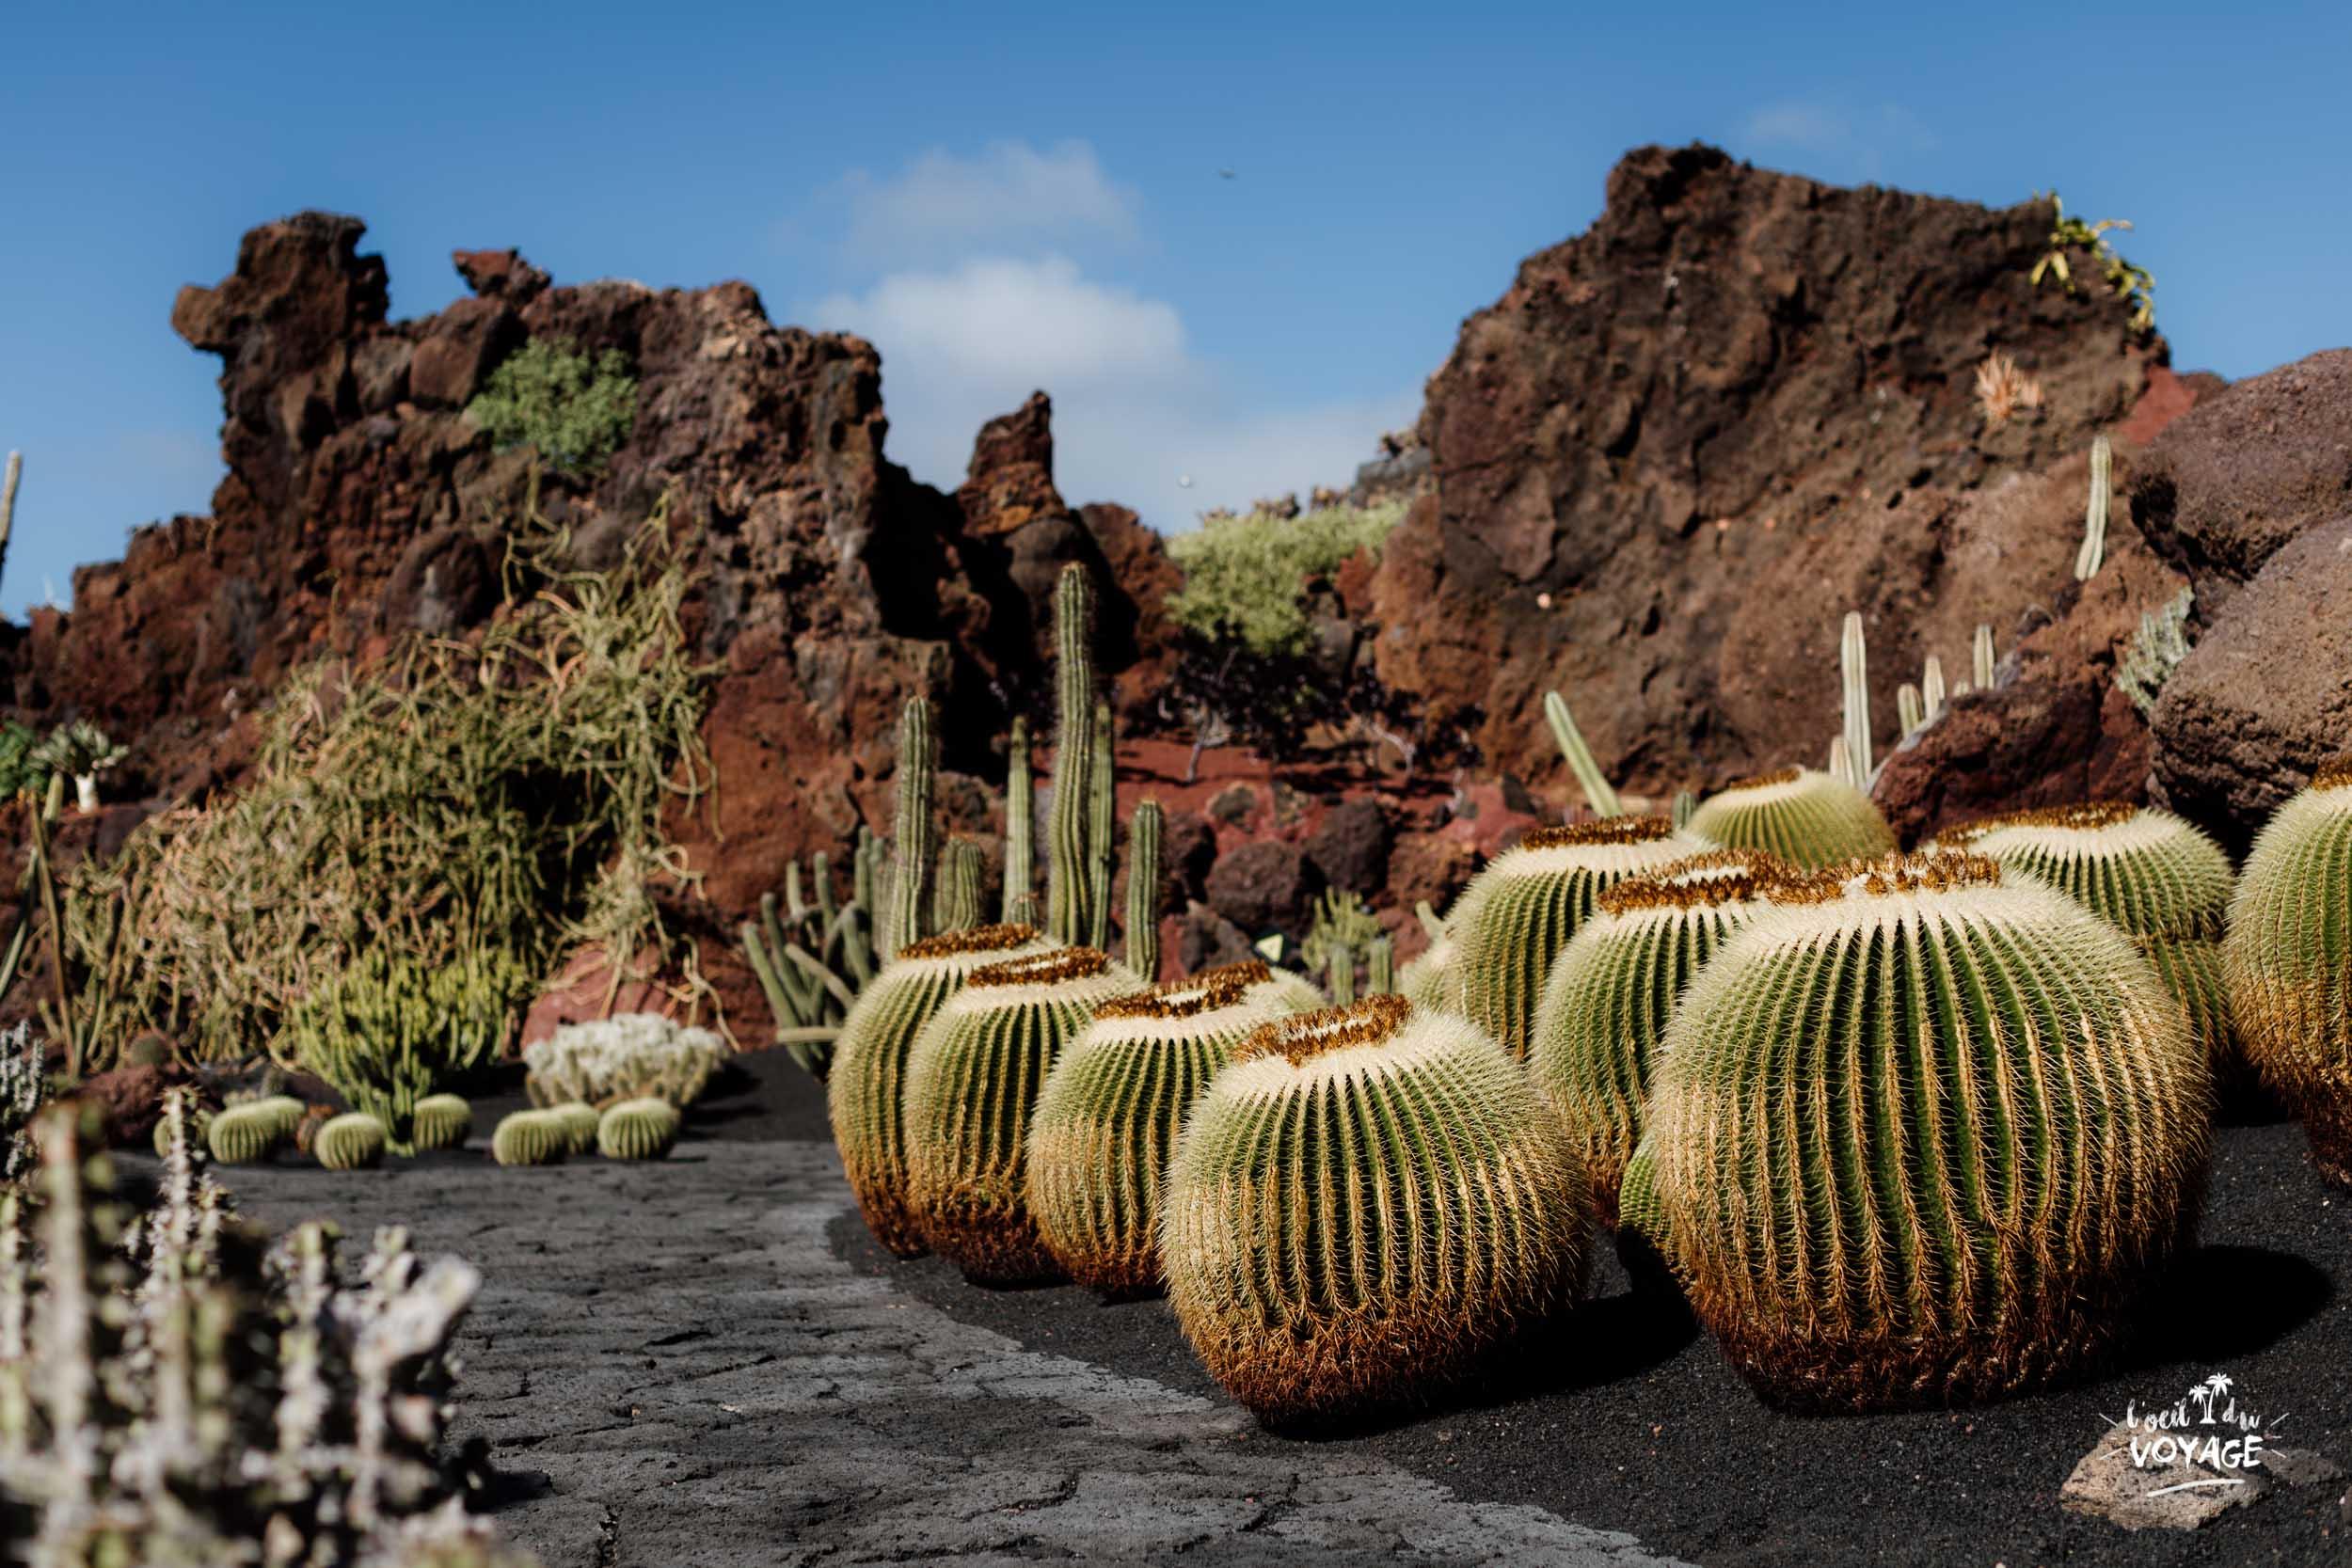 Jardin de Cactus à Guatiza, Lanzarote, par L'oeil de voyage, french travel blogger